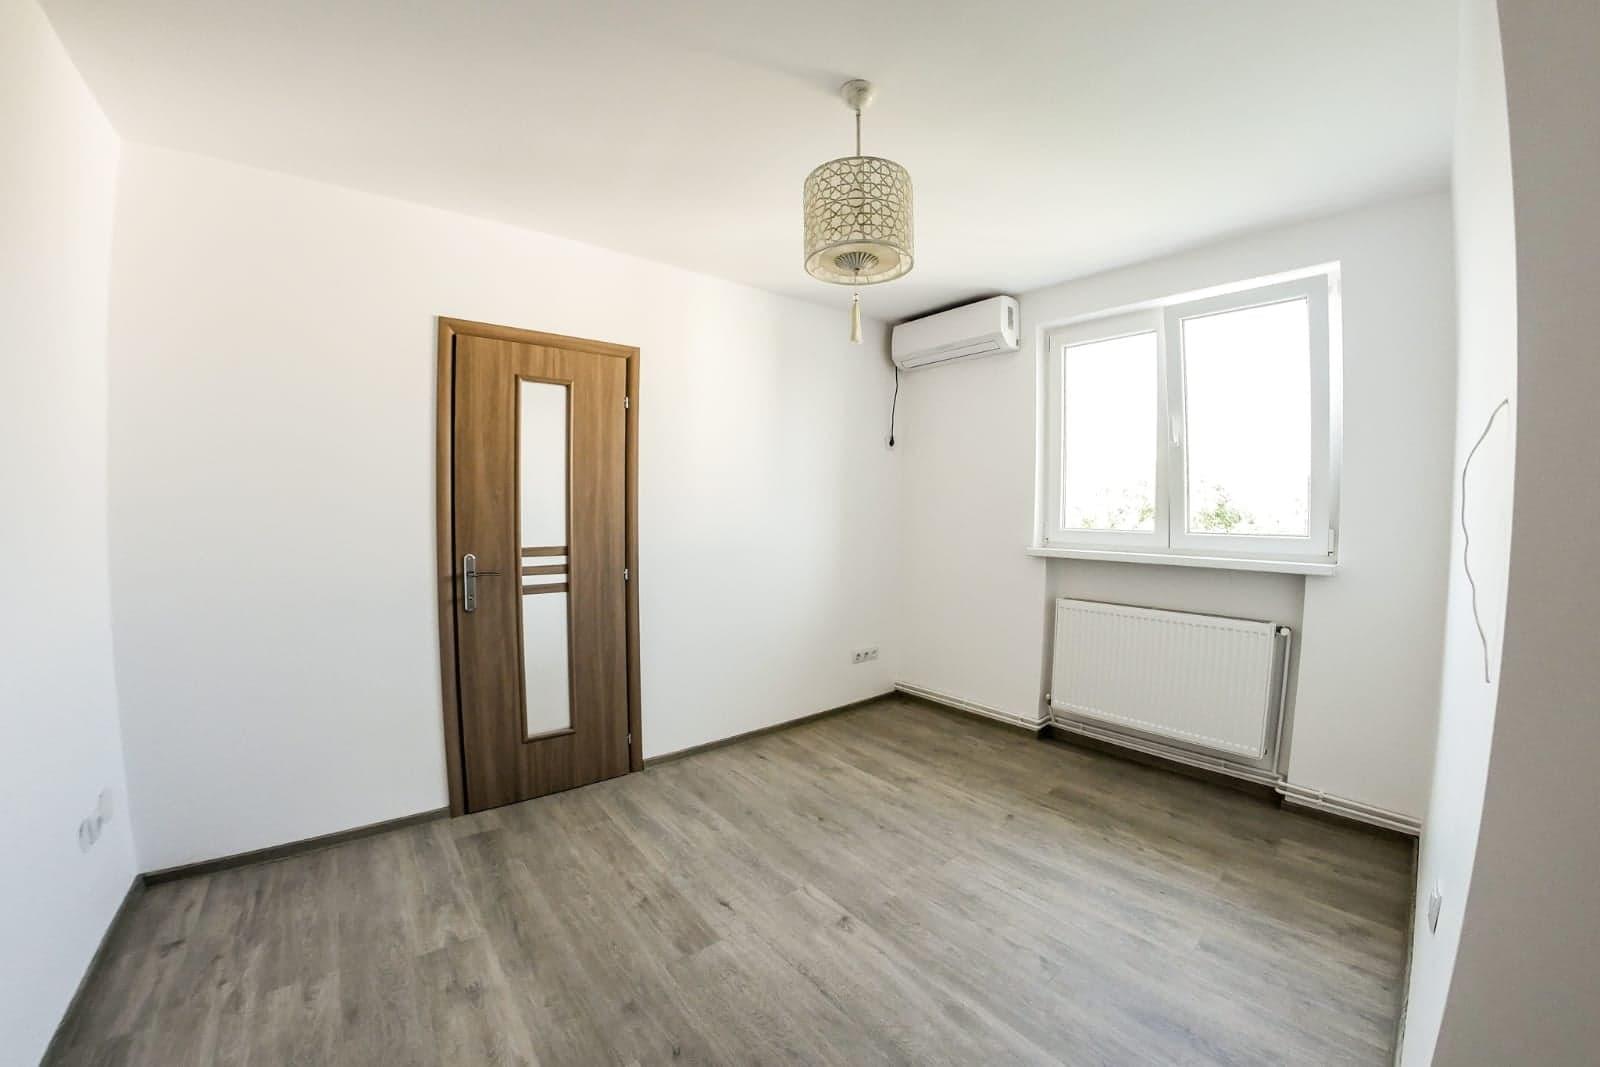 Apartament 2 camere renovat si amenajat de vanzare, Targu Mures Rovinari